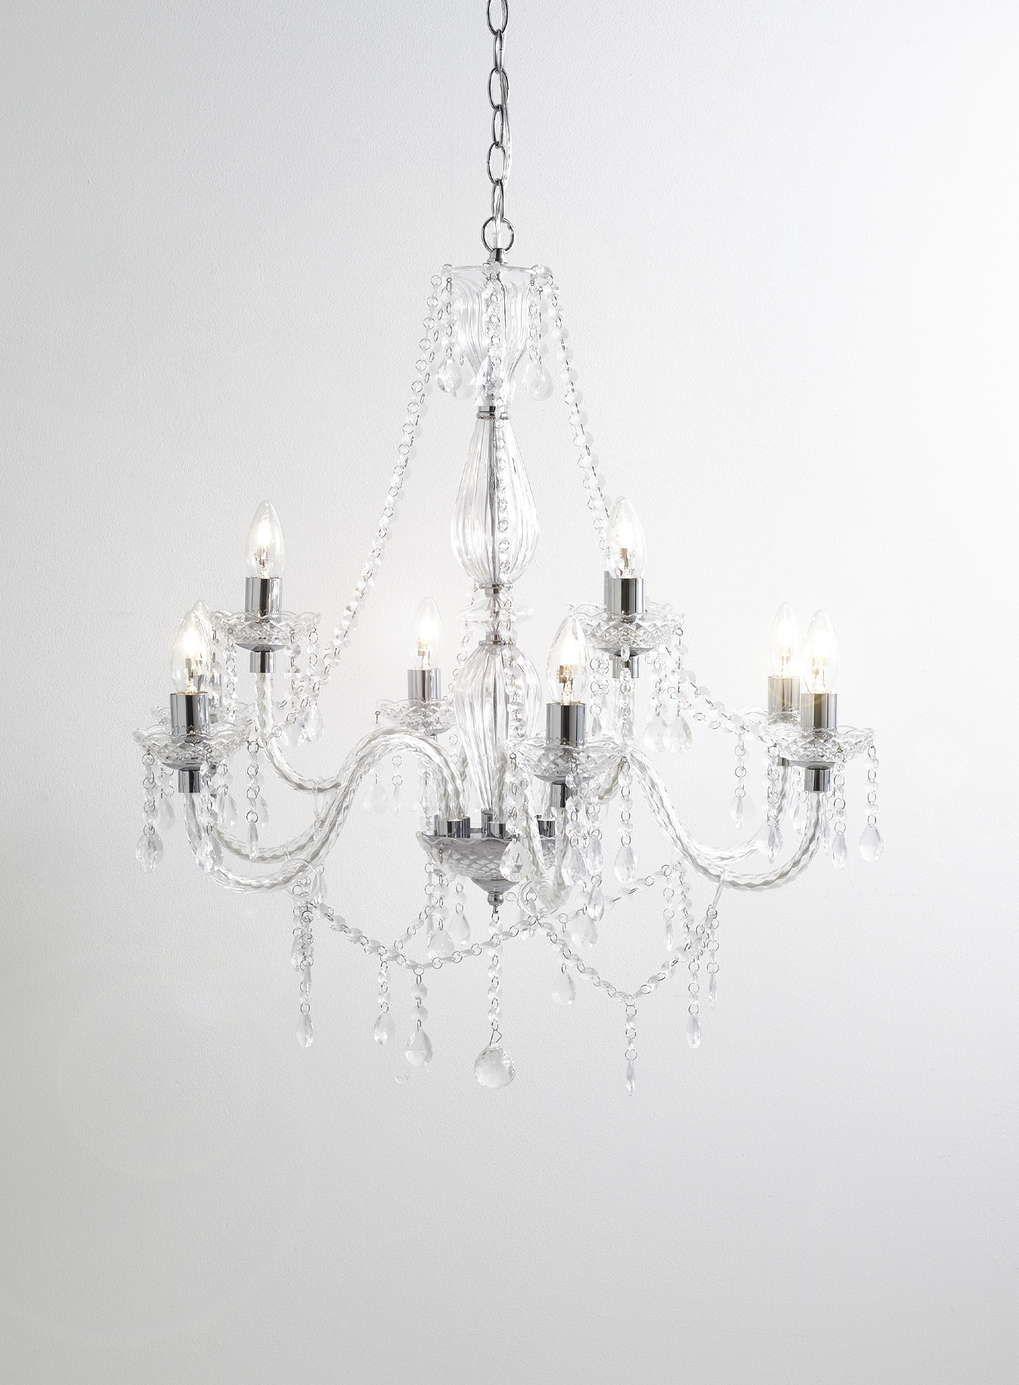 Chrome Bryony 9 Light Chandelier Bhs Bedroom Lighting Living Room Crystal Glass